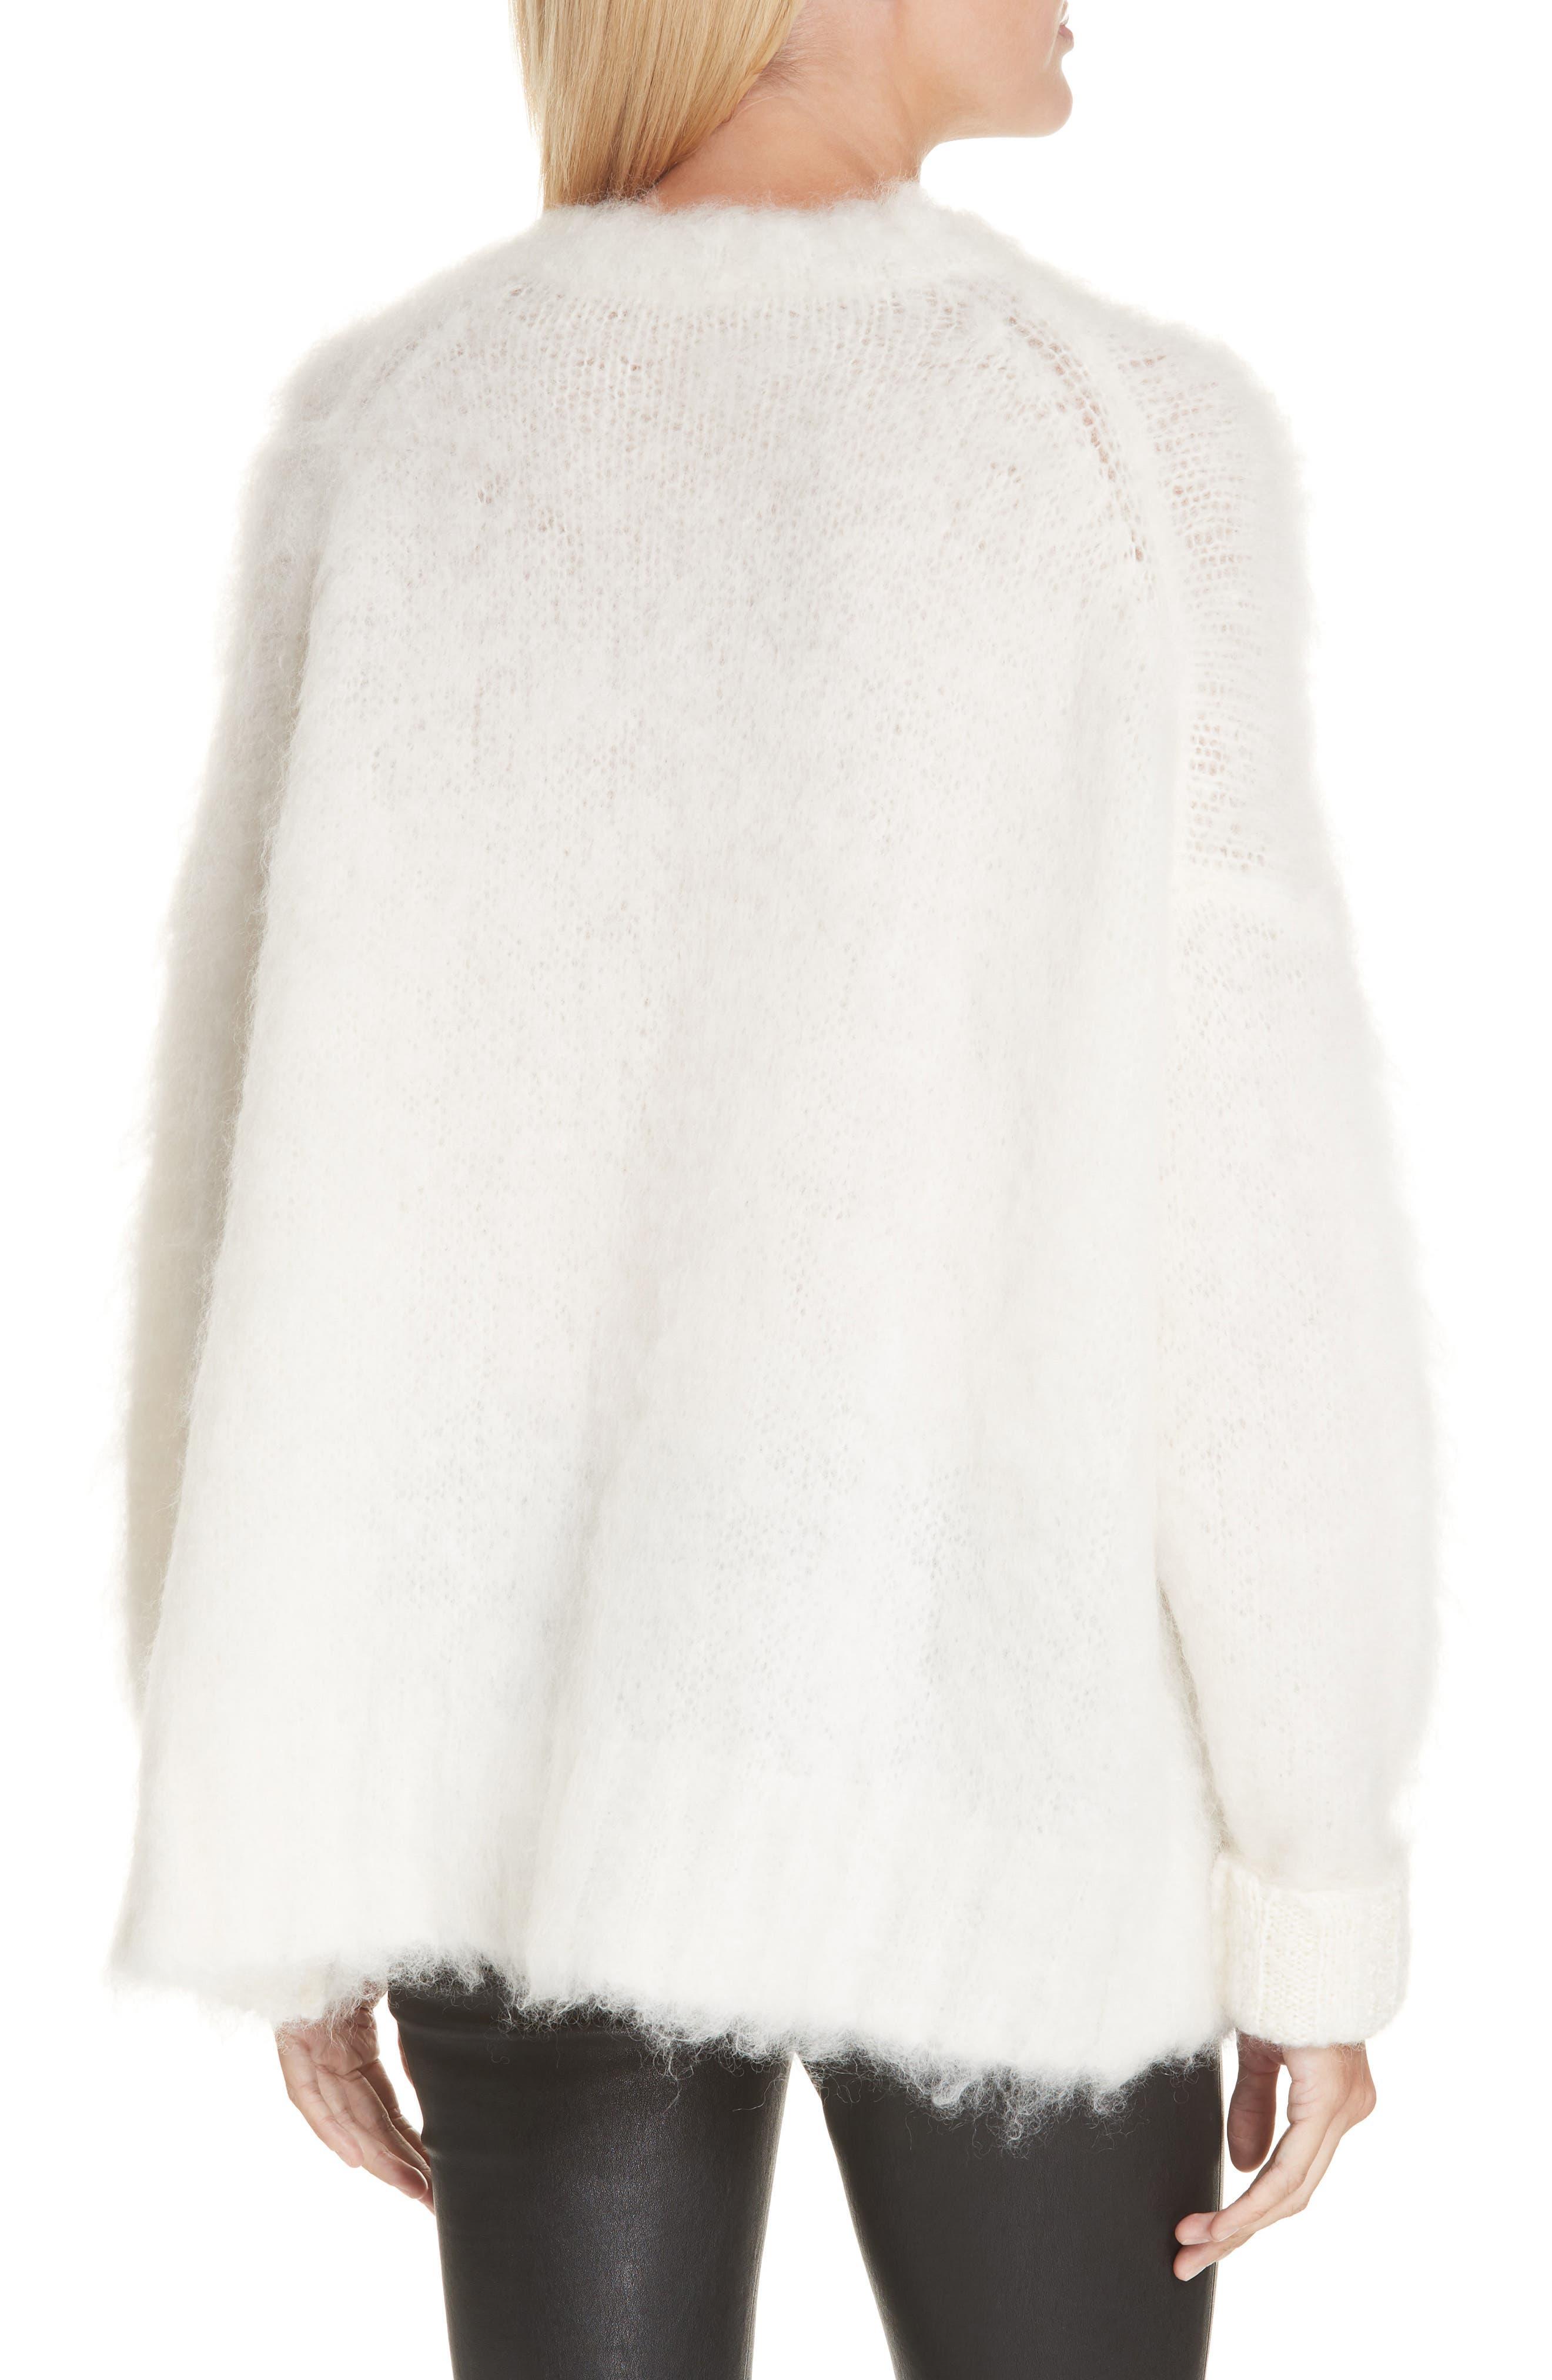 HELMUT LANG, Mohair Blend Sweater, Alternate thumbnail 2, color, NATURAL WHITE